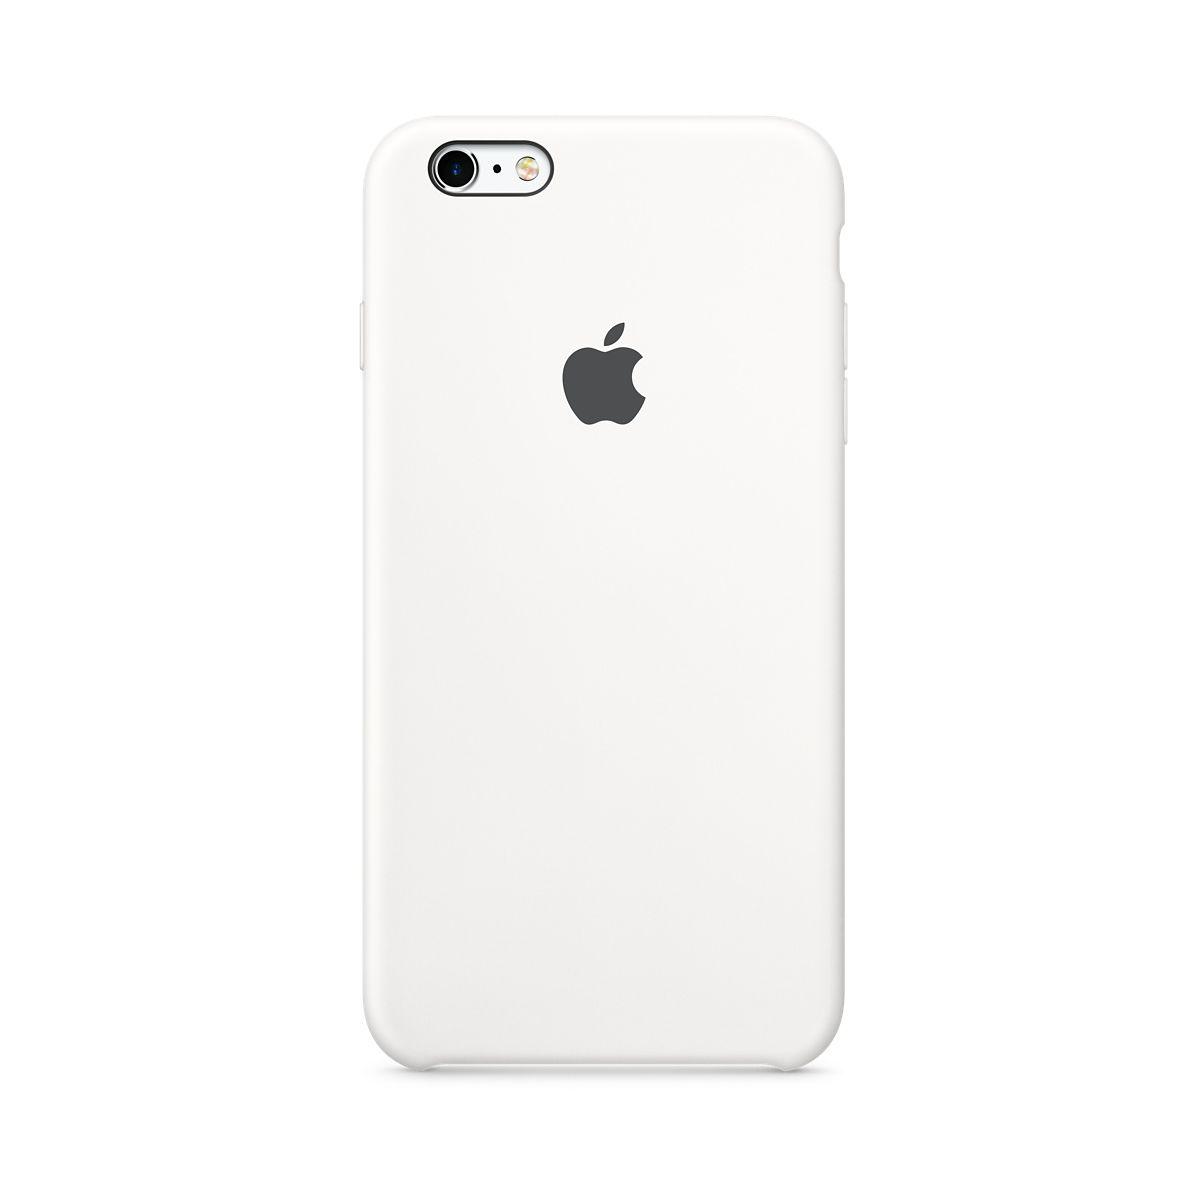 Coque APPLE iPhone 6/6s blanc